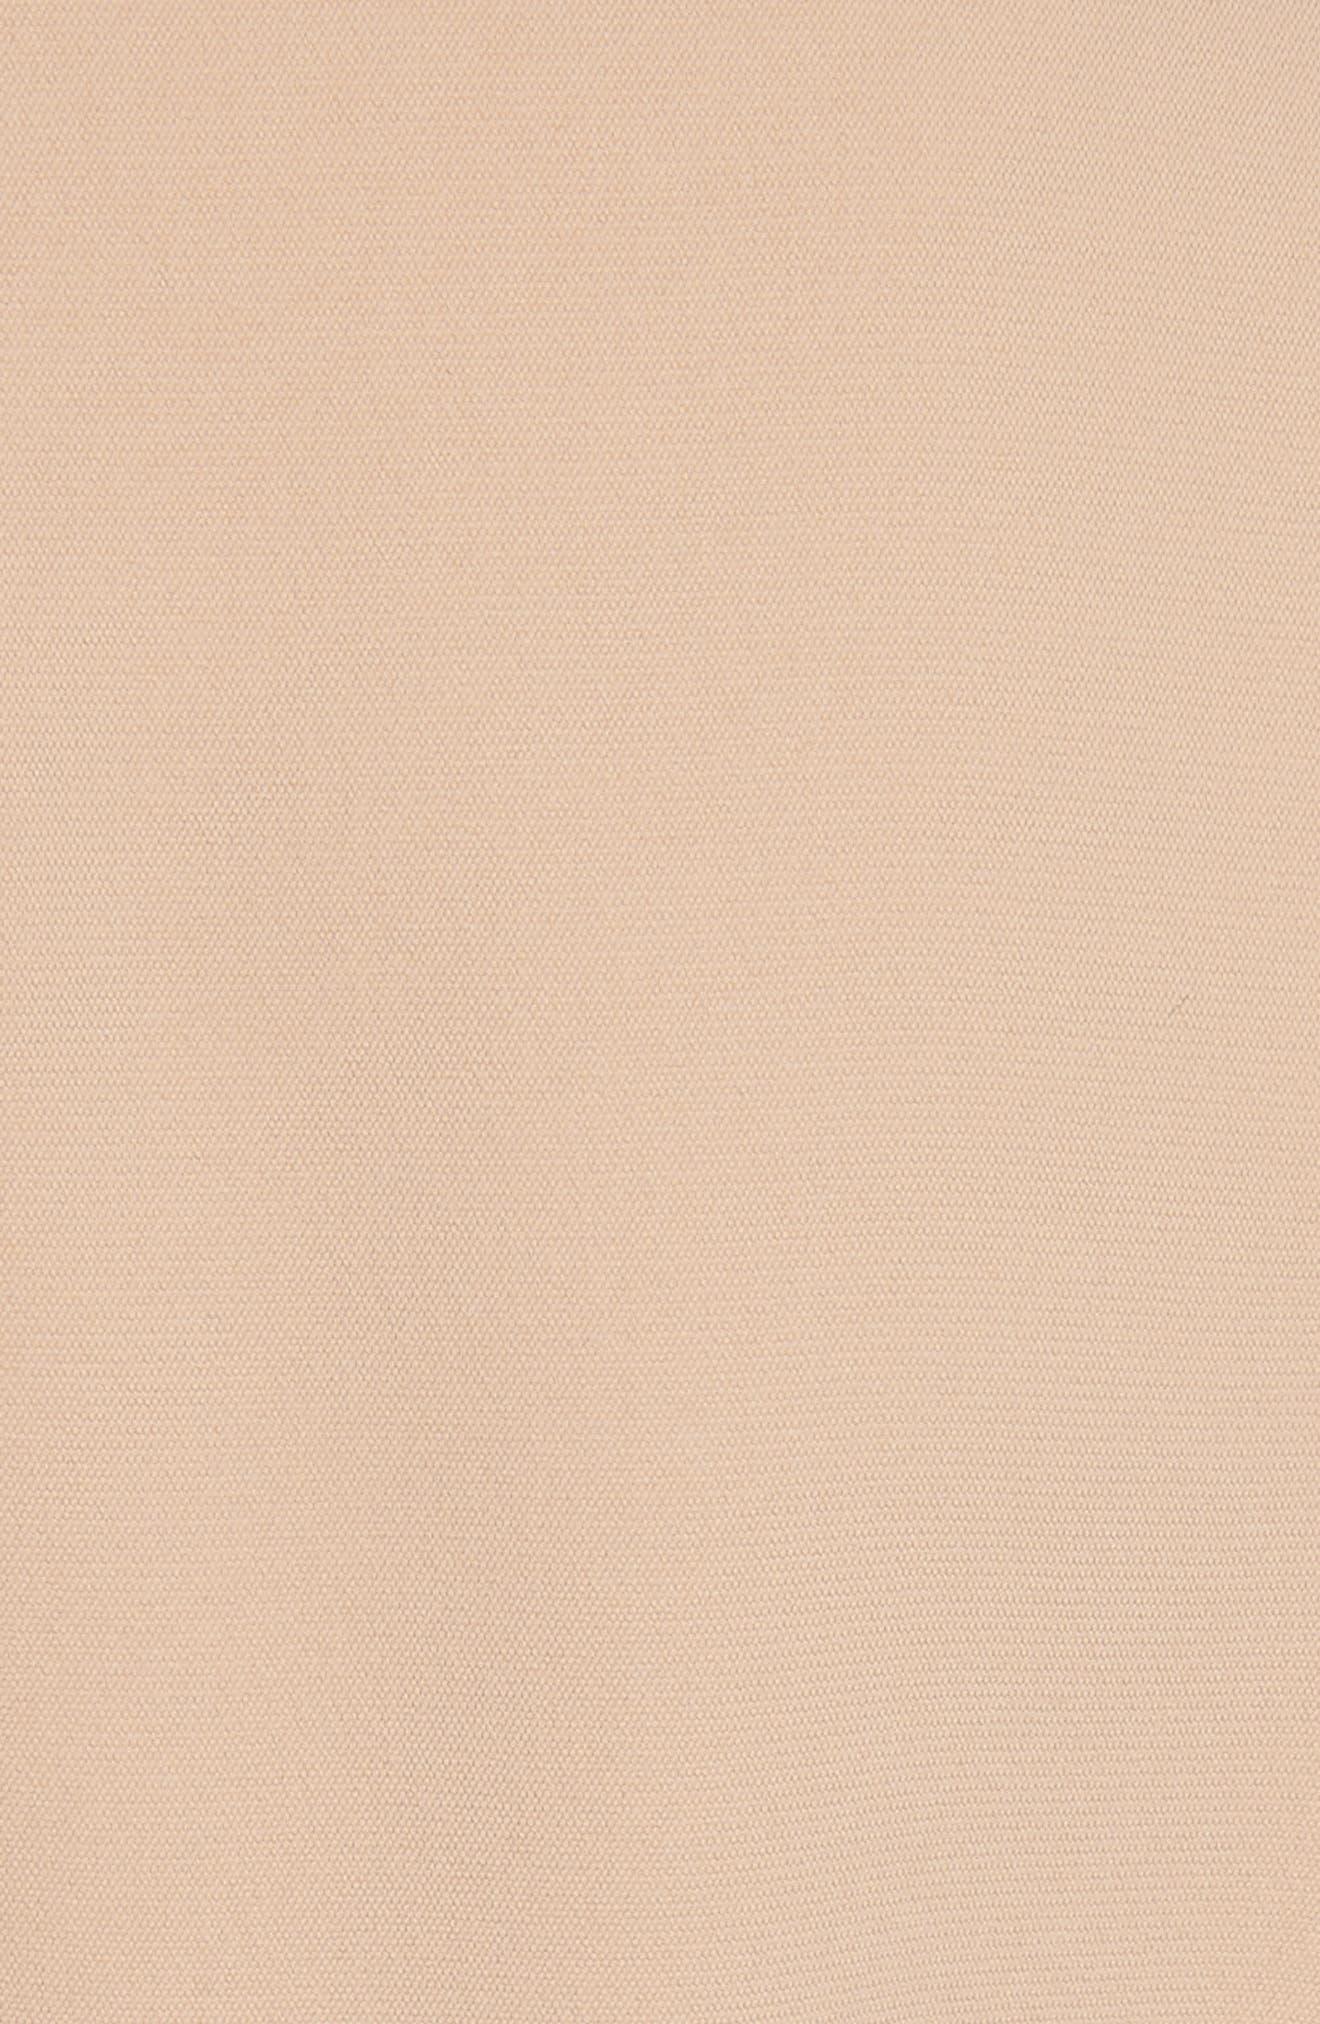 Shirred Sleeve Corset Dress,                             Alternate thumbnail 6, color,                             NUDE/ ORANGE MULTI